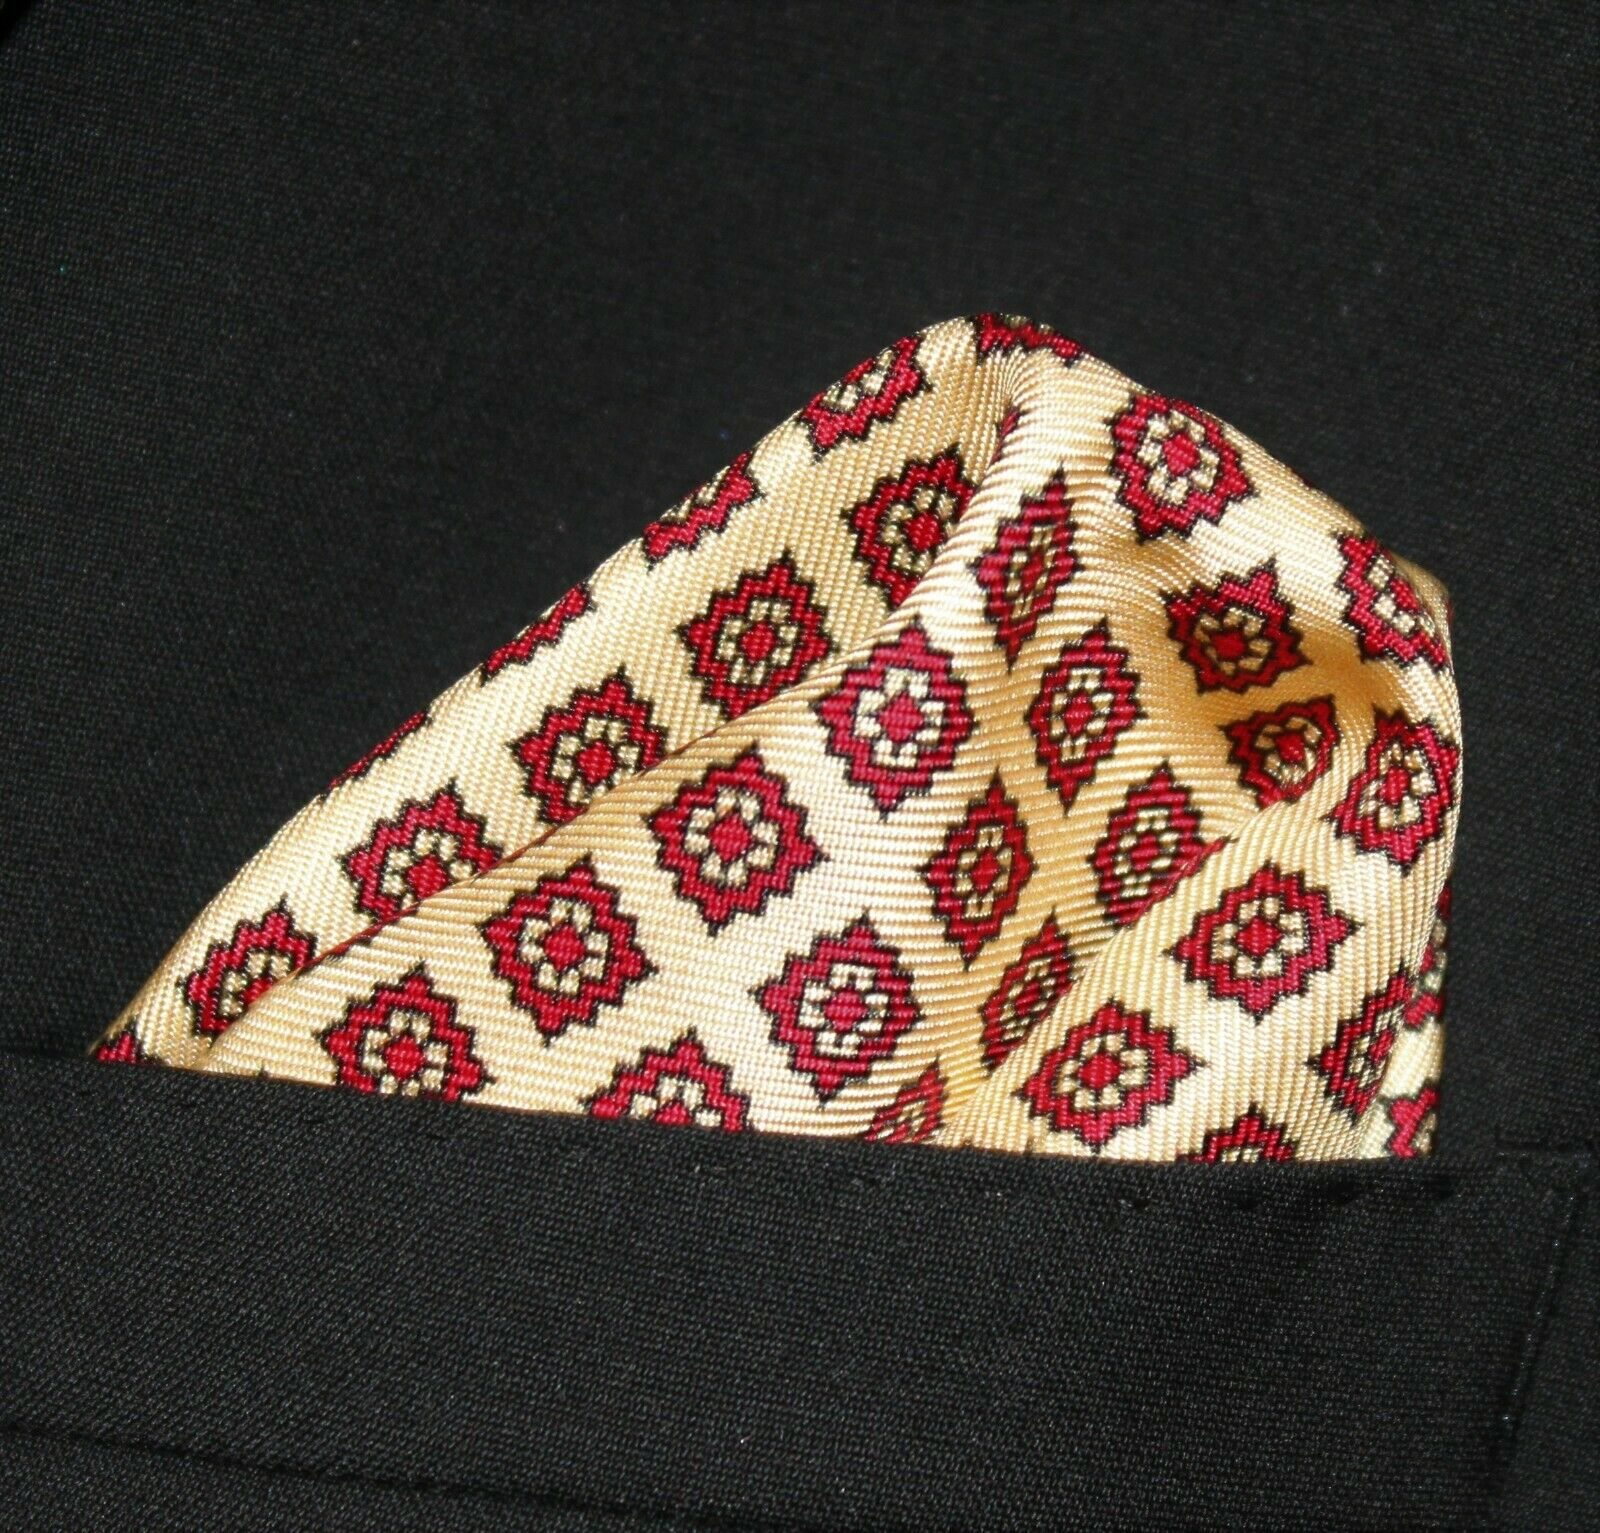 100% SILK Pocket Square Handkerchief - UK Made - Light Gold & Red DBH-03